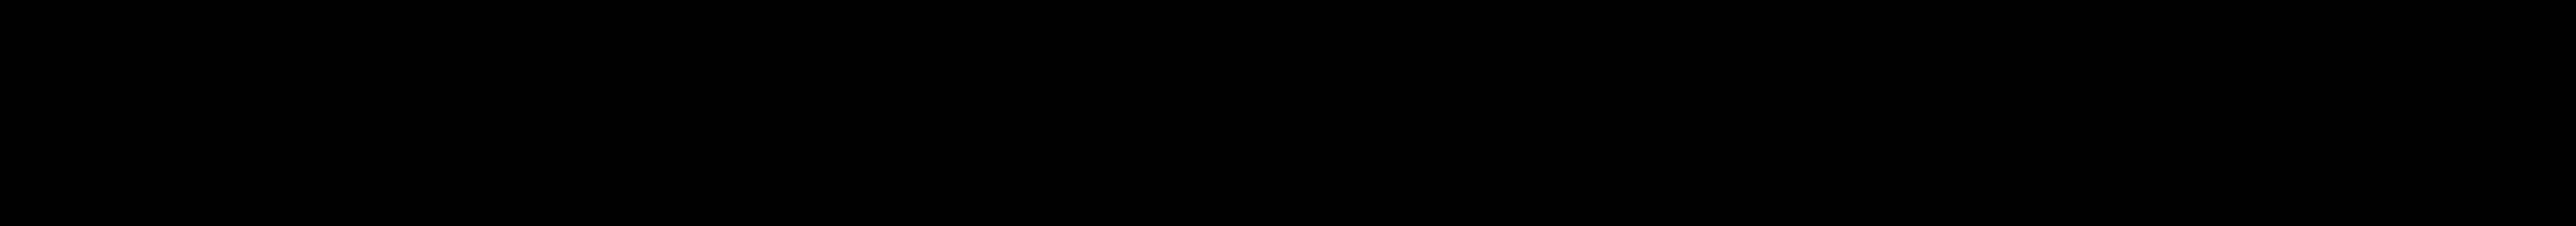 Korataki Extrabold